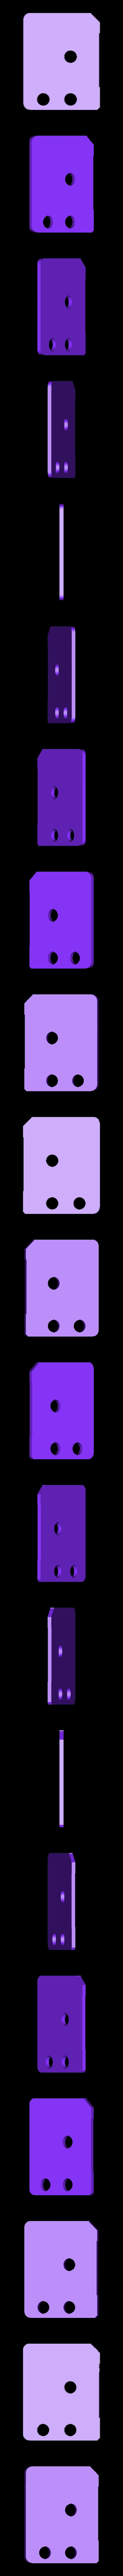 patch1 (1pcs).STL Download STL file Folding Quadcopter 450 Frame • 3D print object, AleksandrDolzhenko